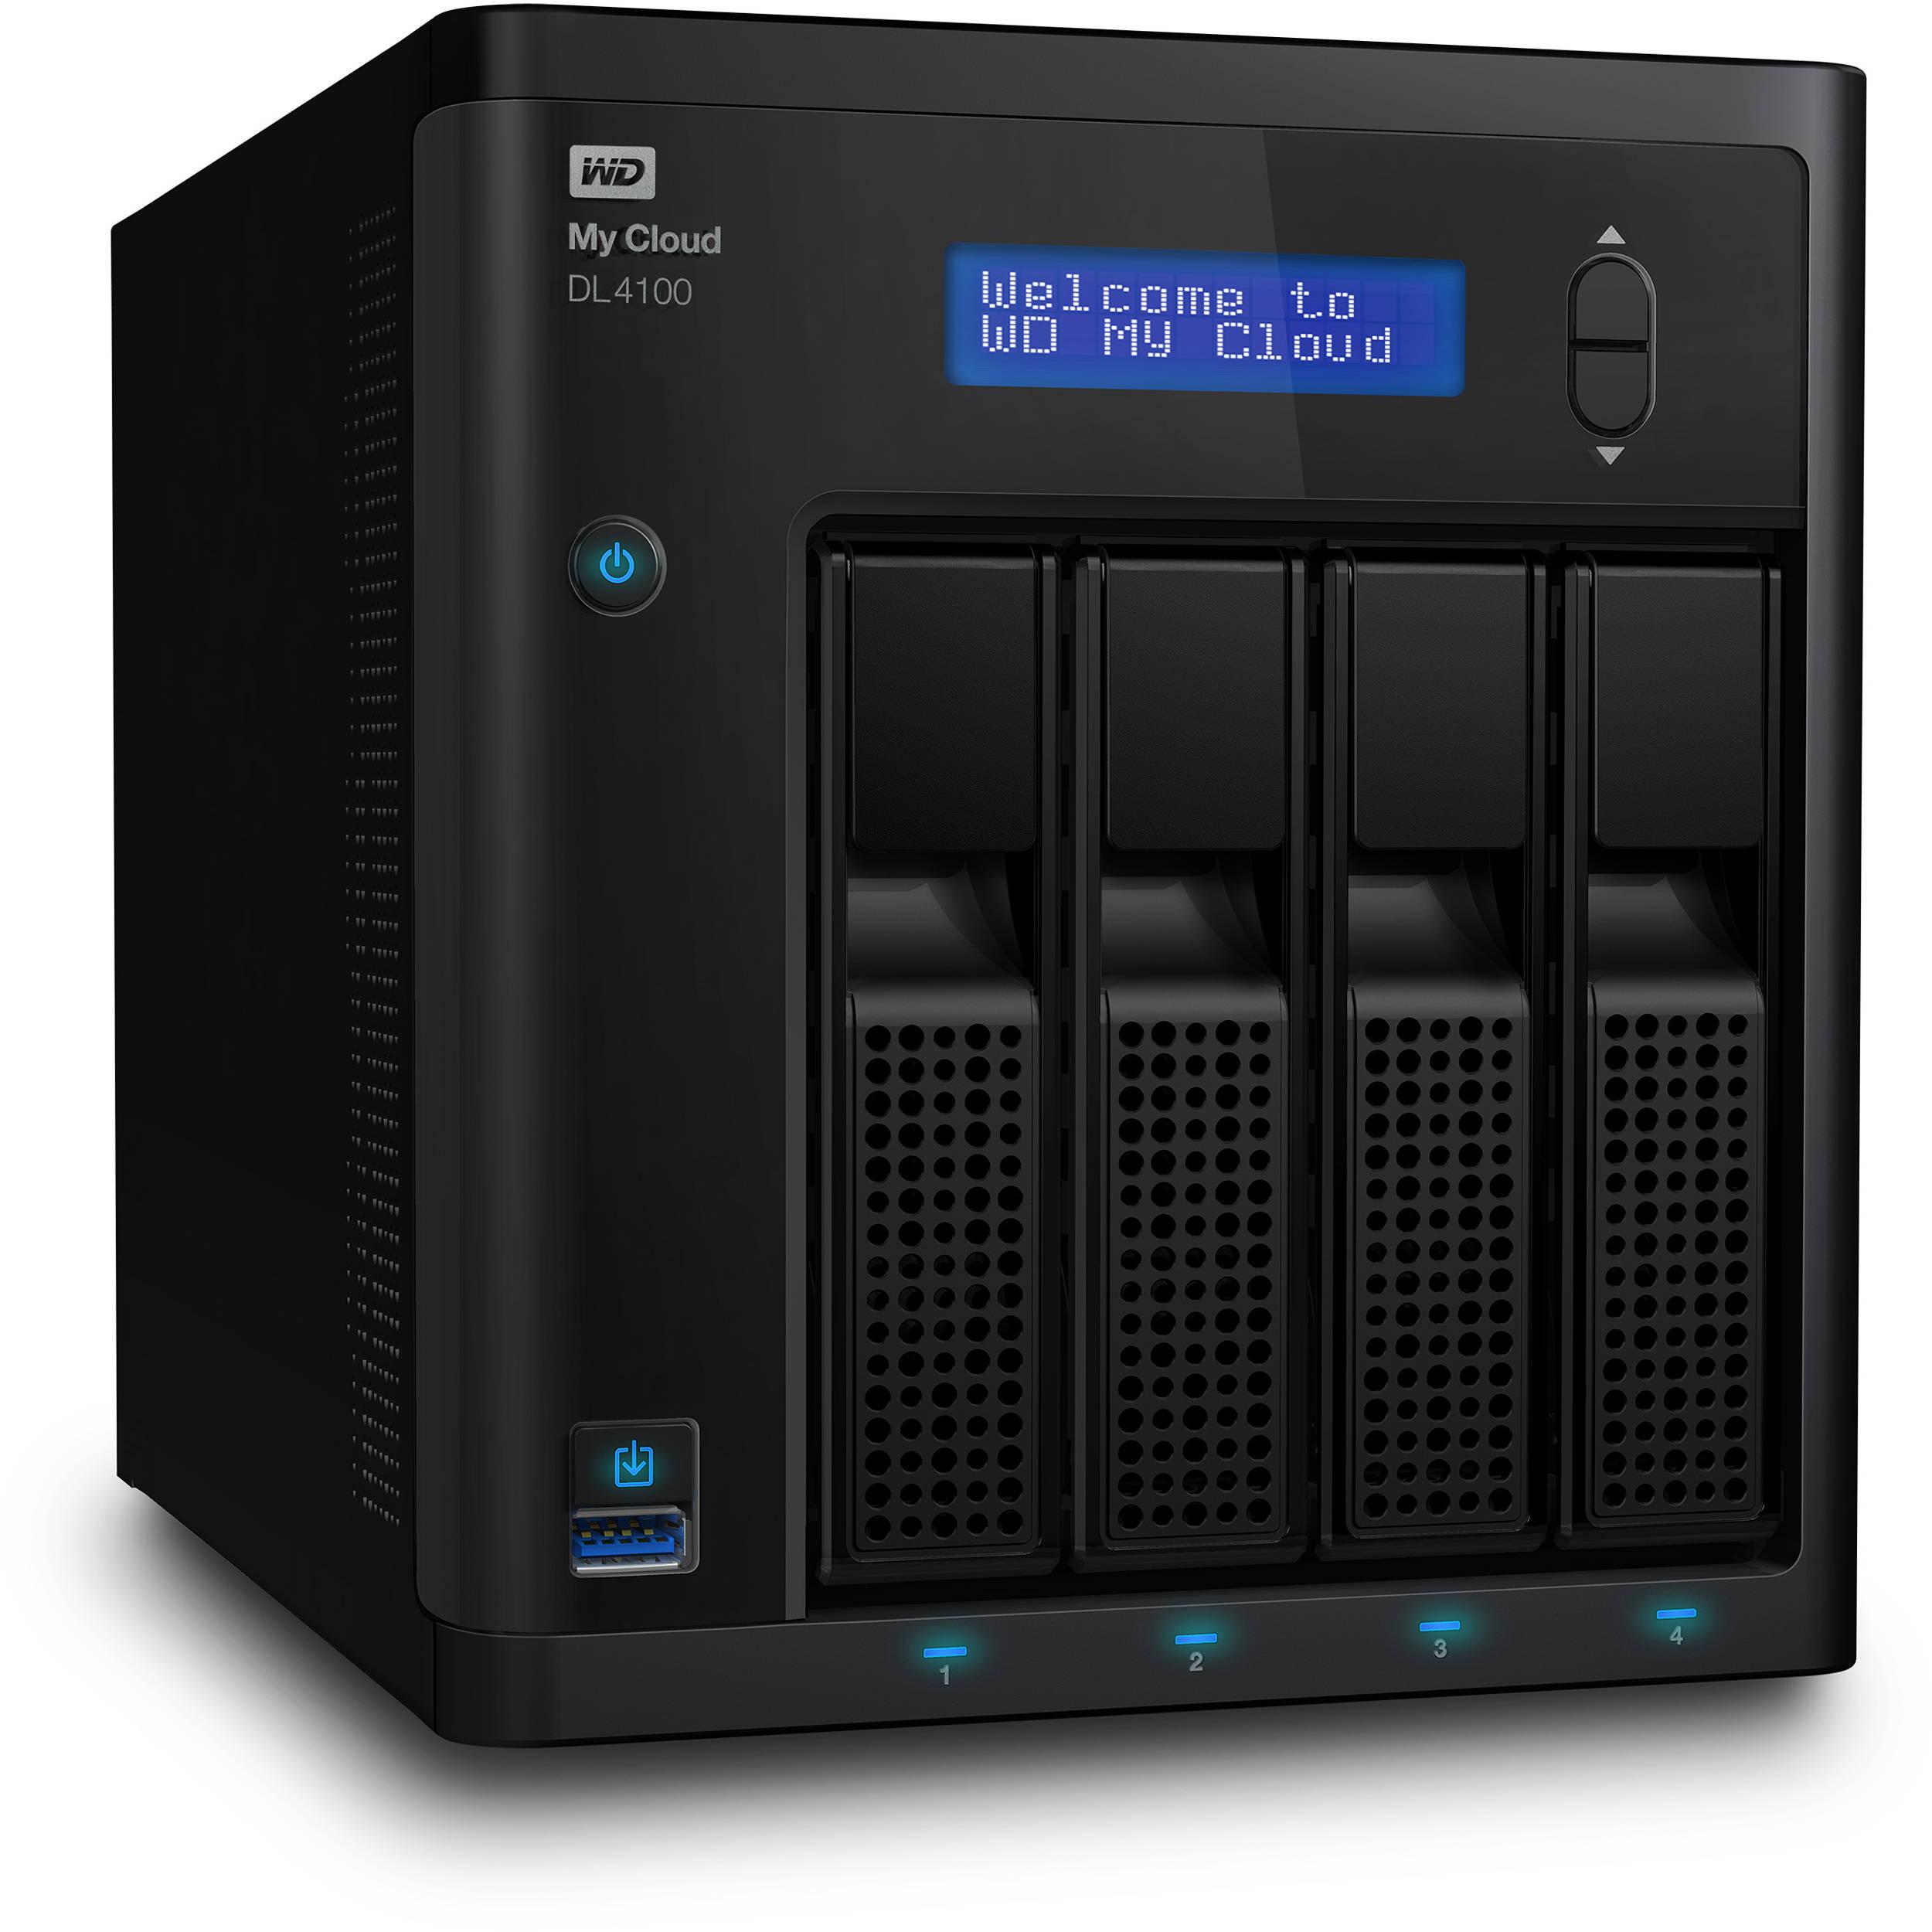 WD 8TB (2 x 4TB) My Cloud Business Series DL4100 4-Bay NAS